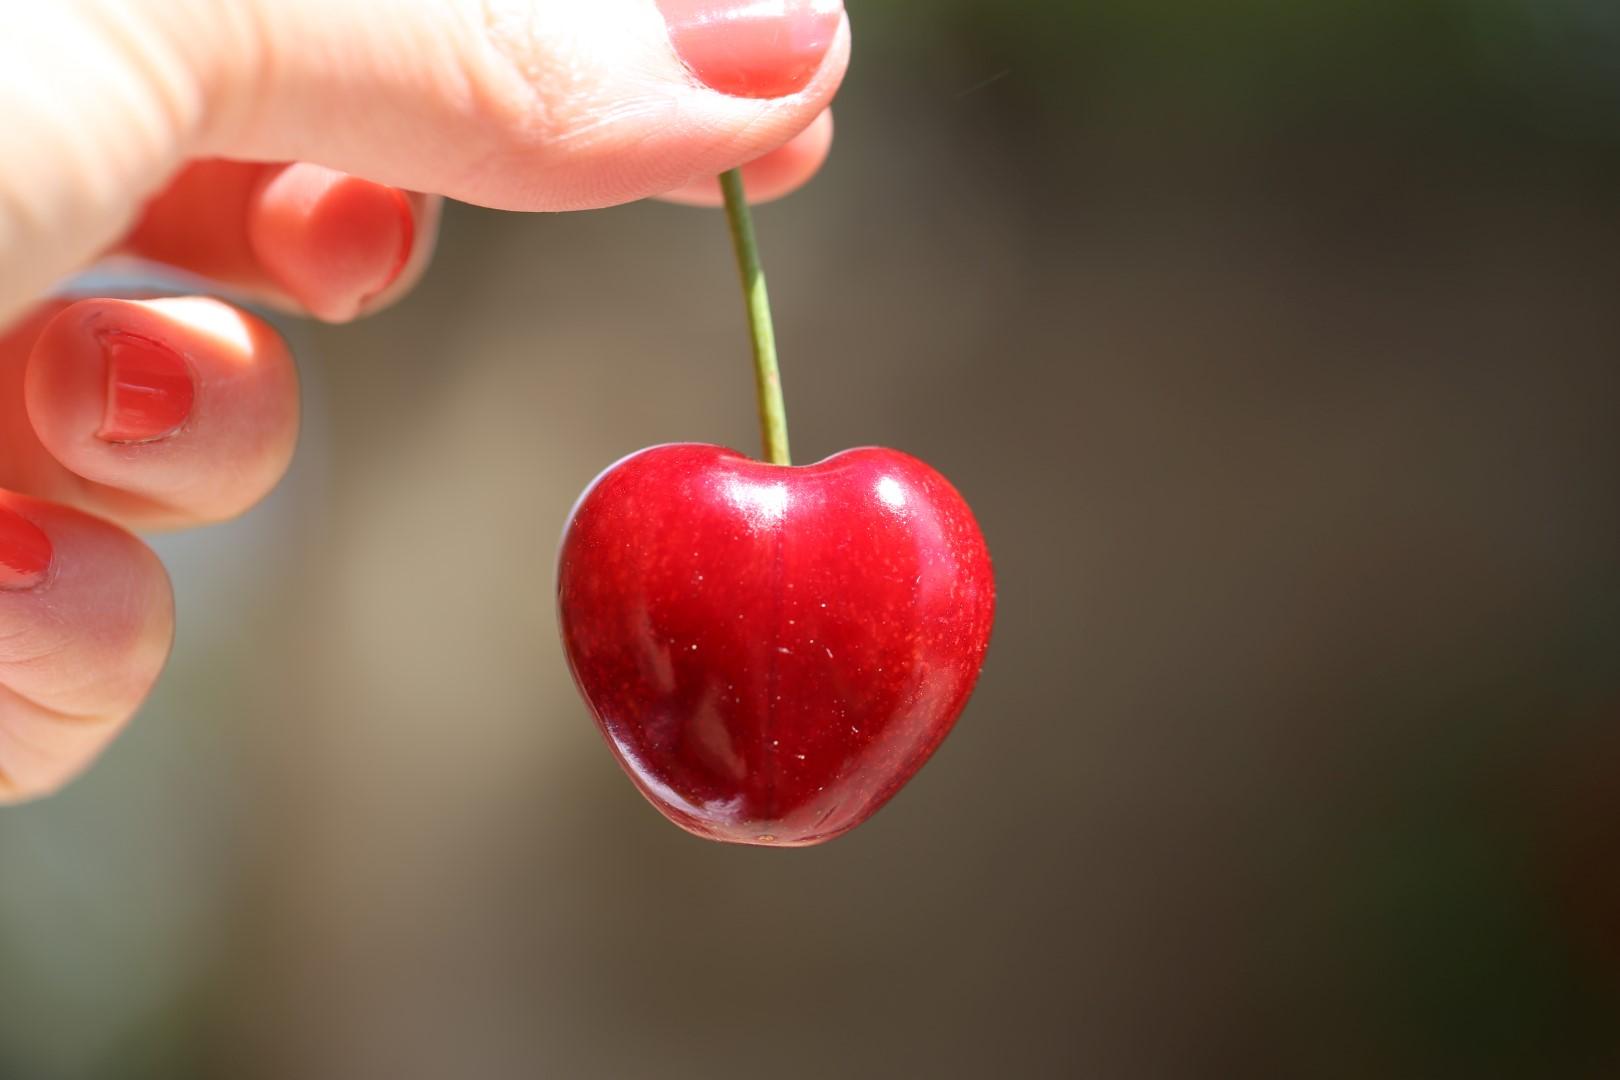 cerise en forme de coeur